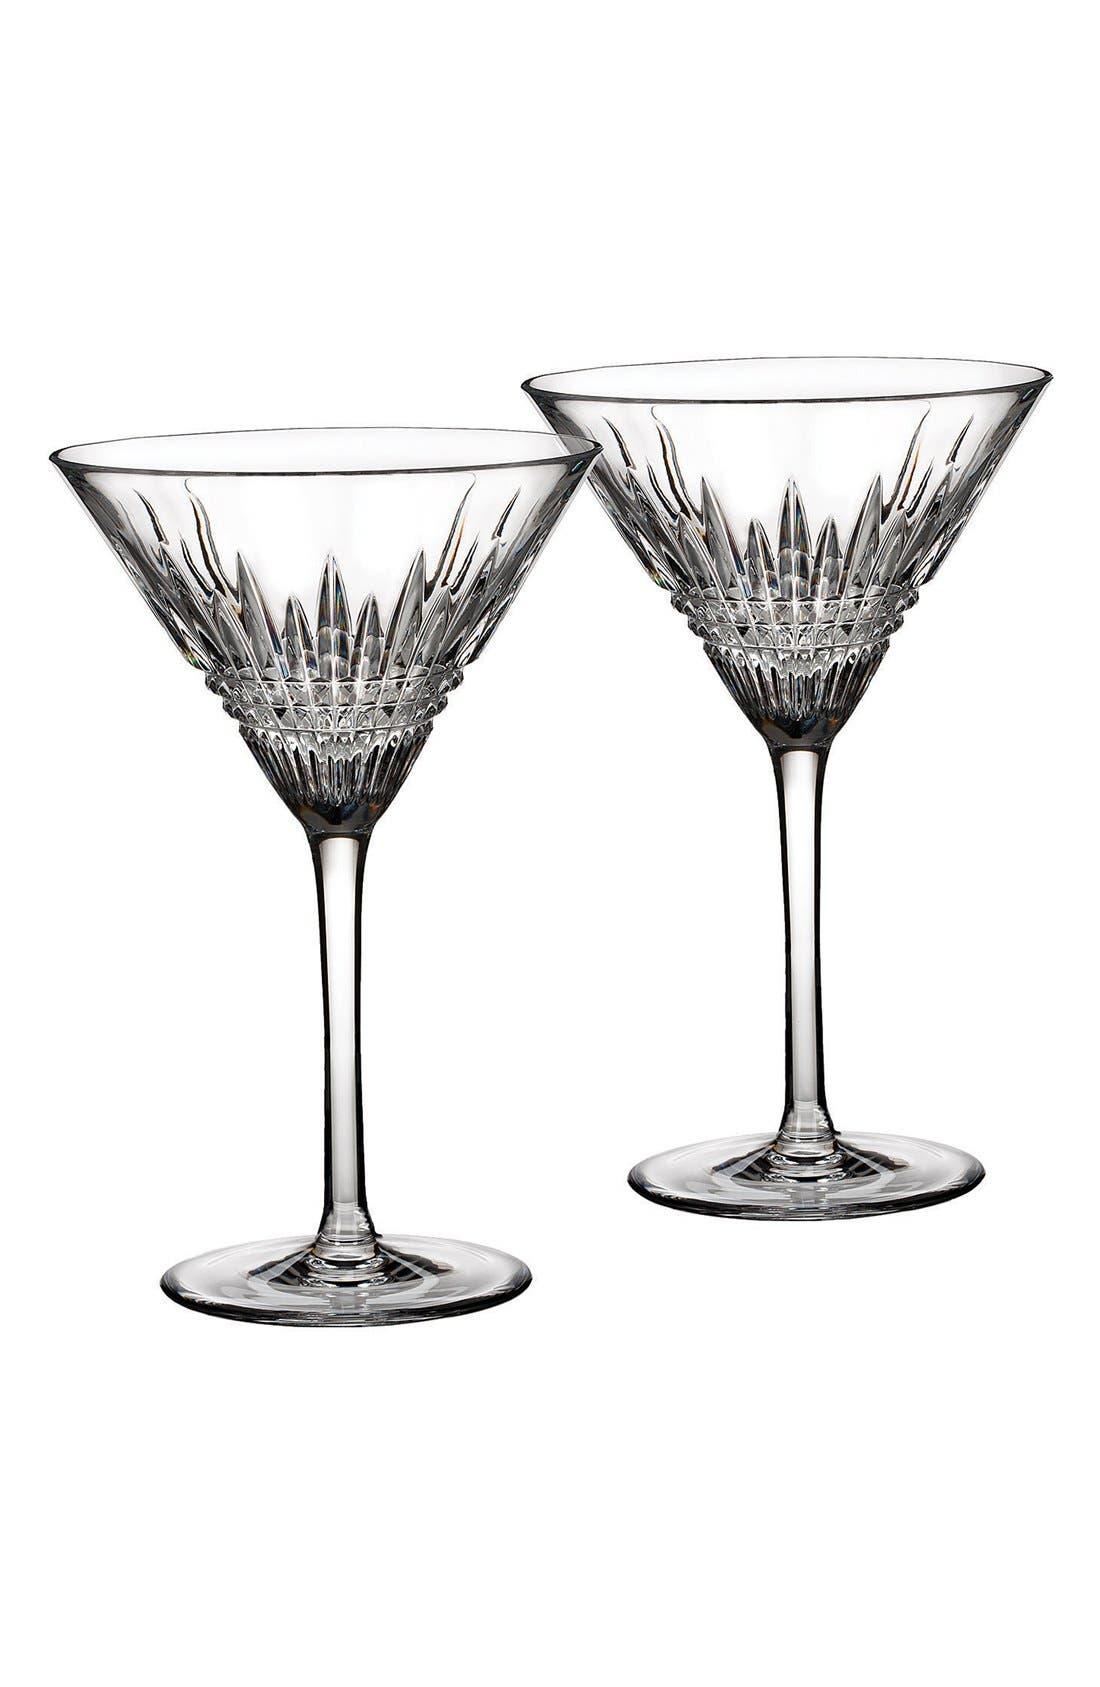 Main Image - Waterford 'Lismore Diamond' Lead Crystal Martini Glasses (Set of 2)